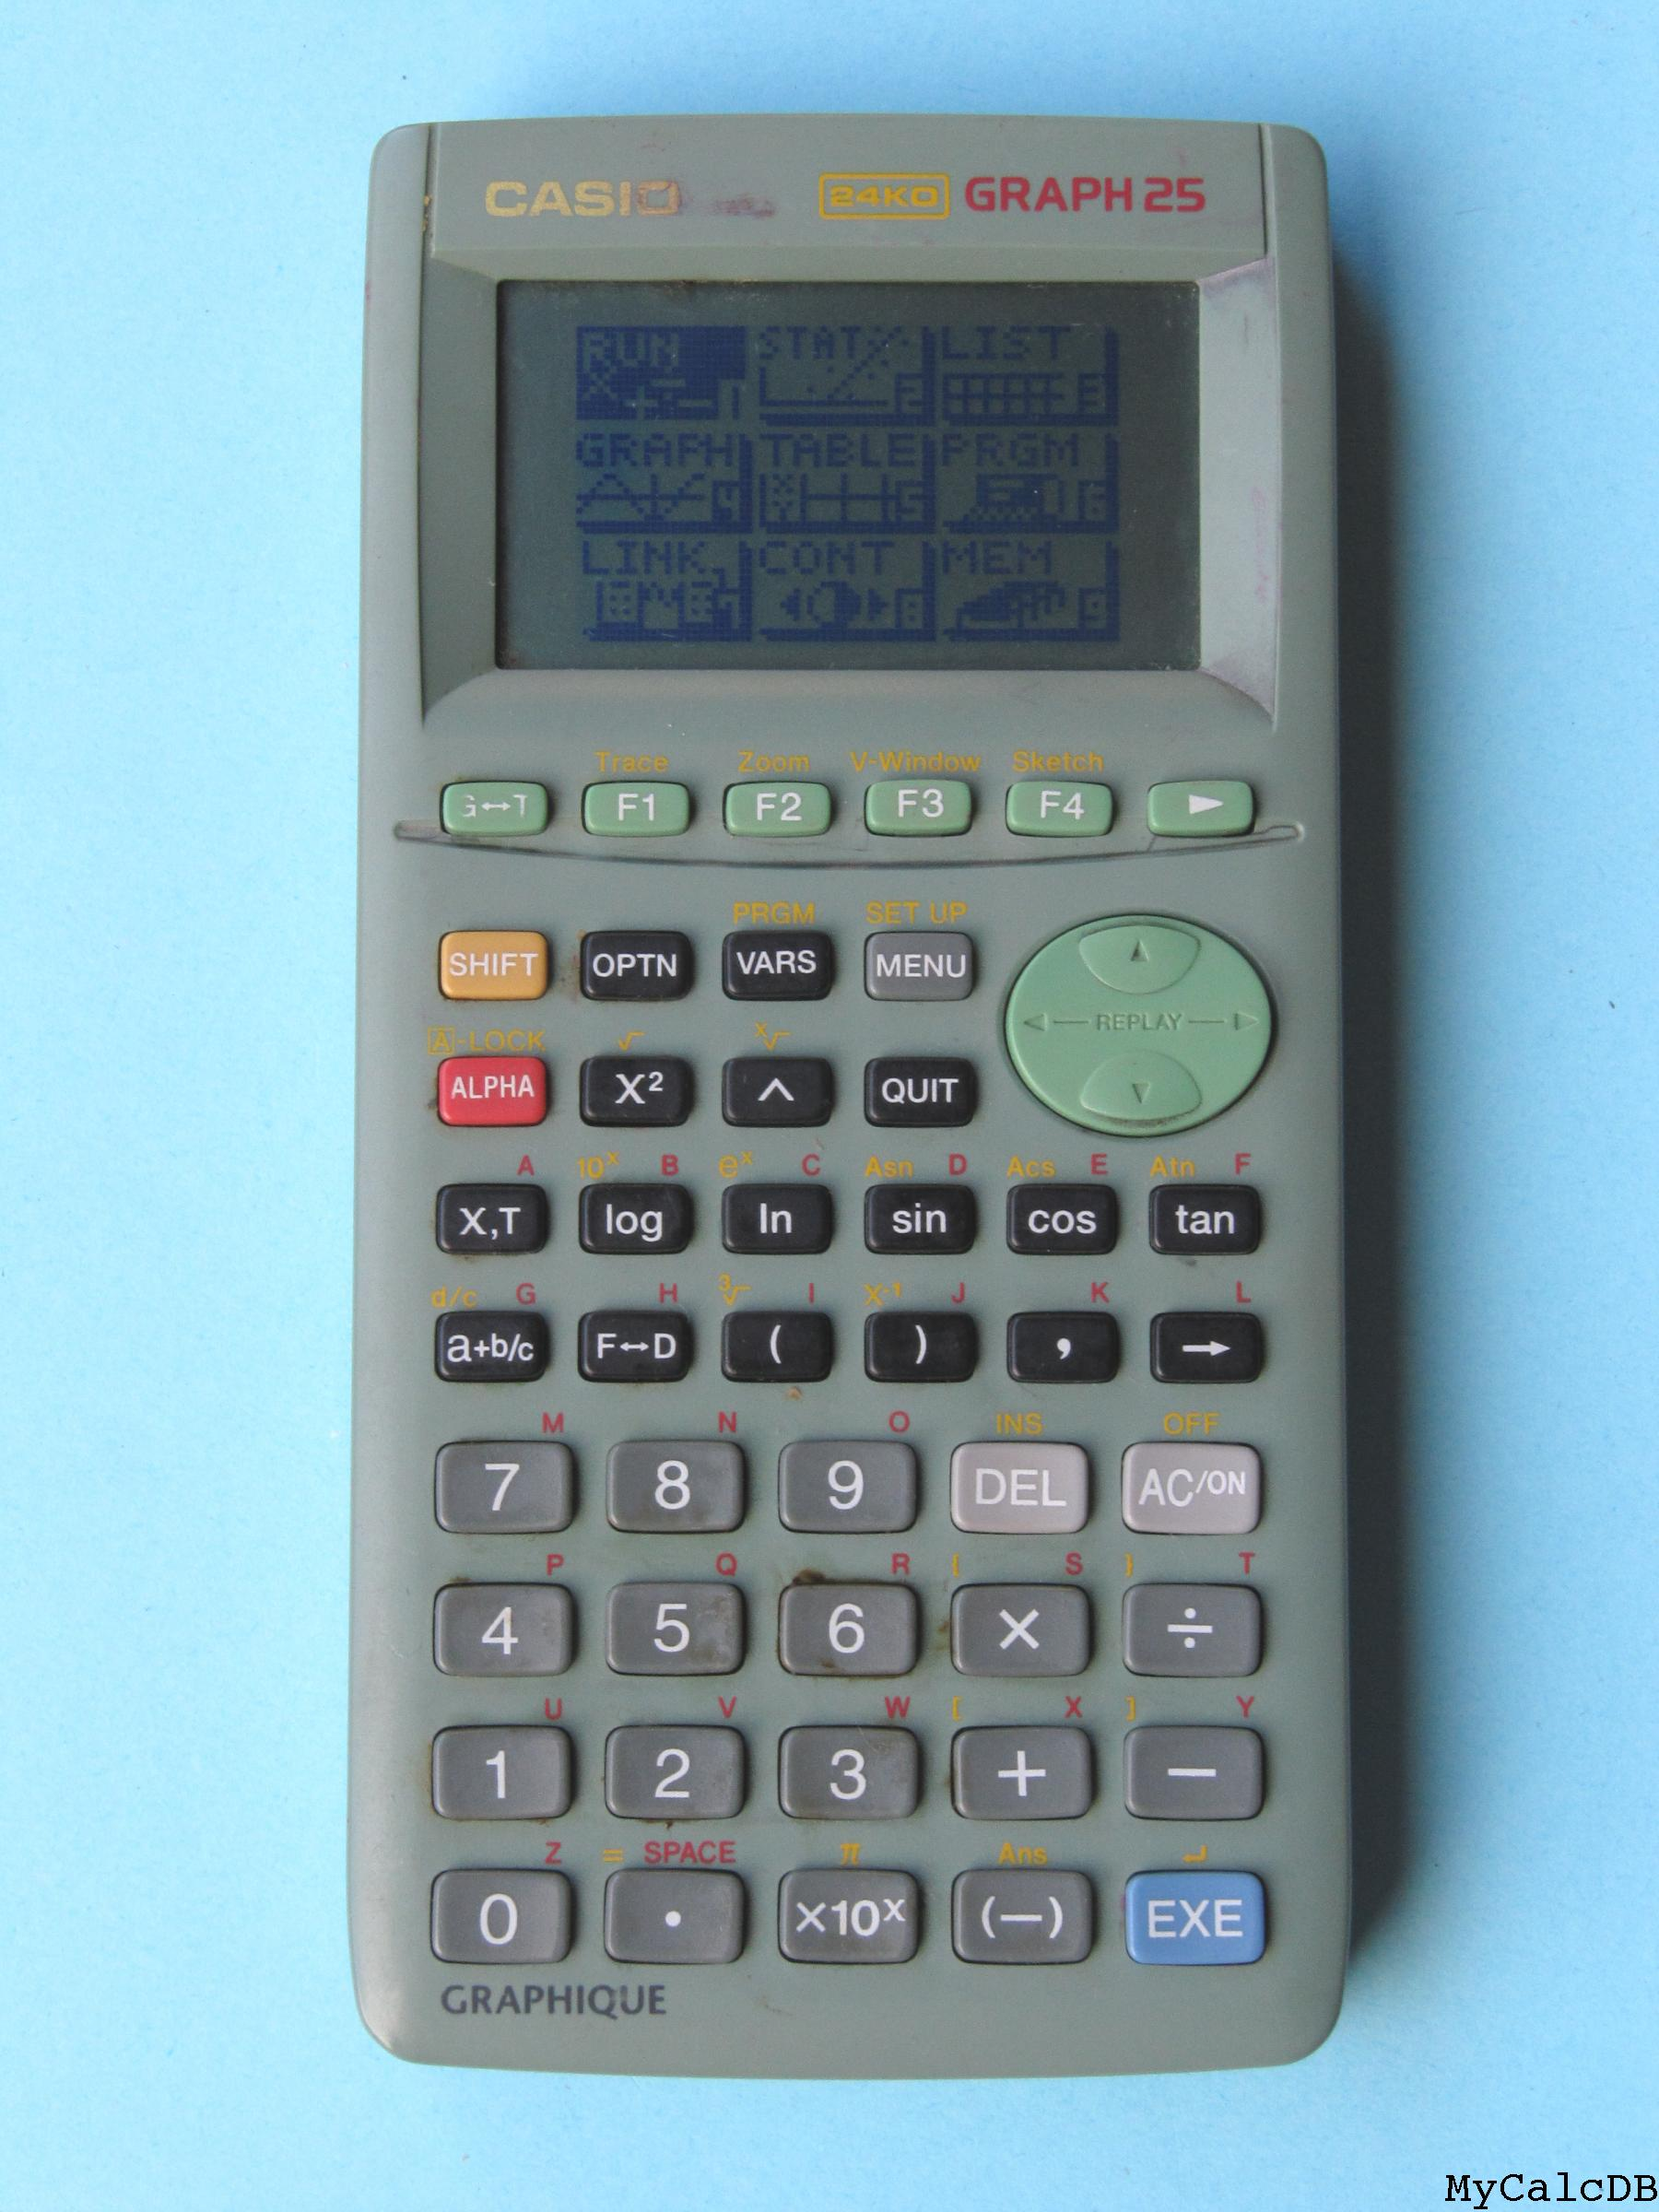 Calculatrice Casio Graph 25+ : calculatrice, casio, graph, MyCalcDB, Calculator, Casio, GRAPH